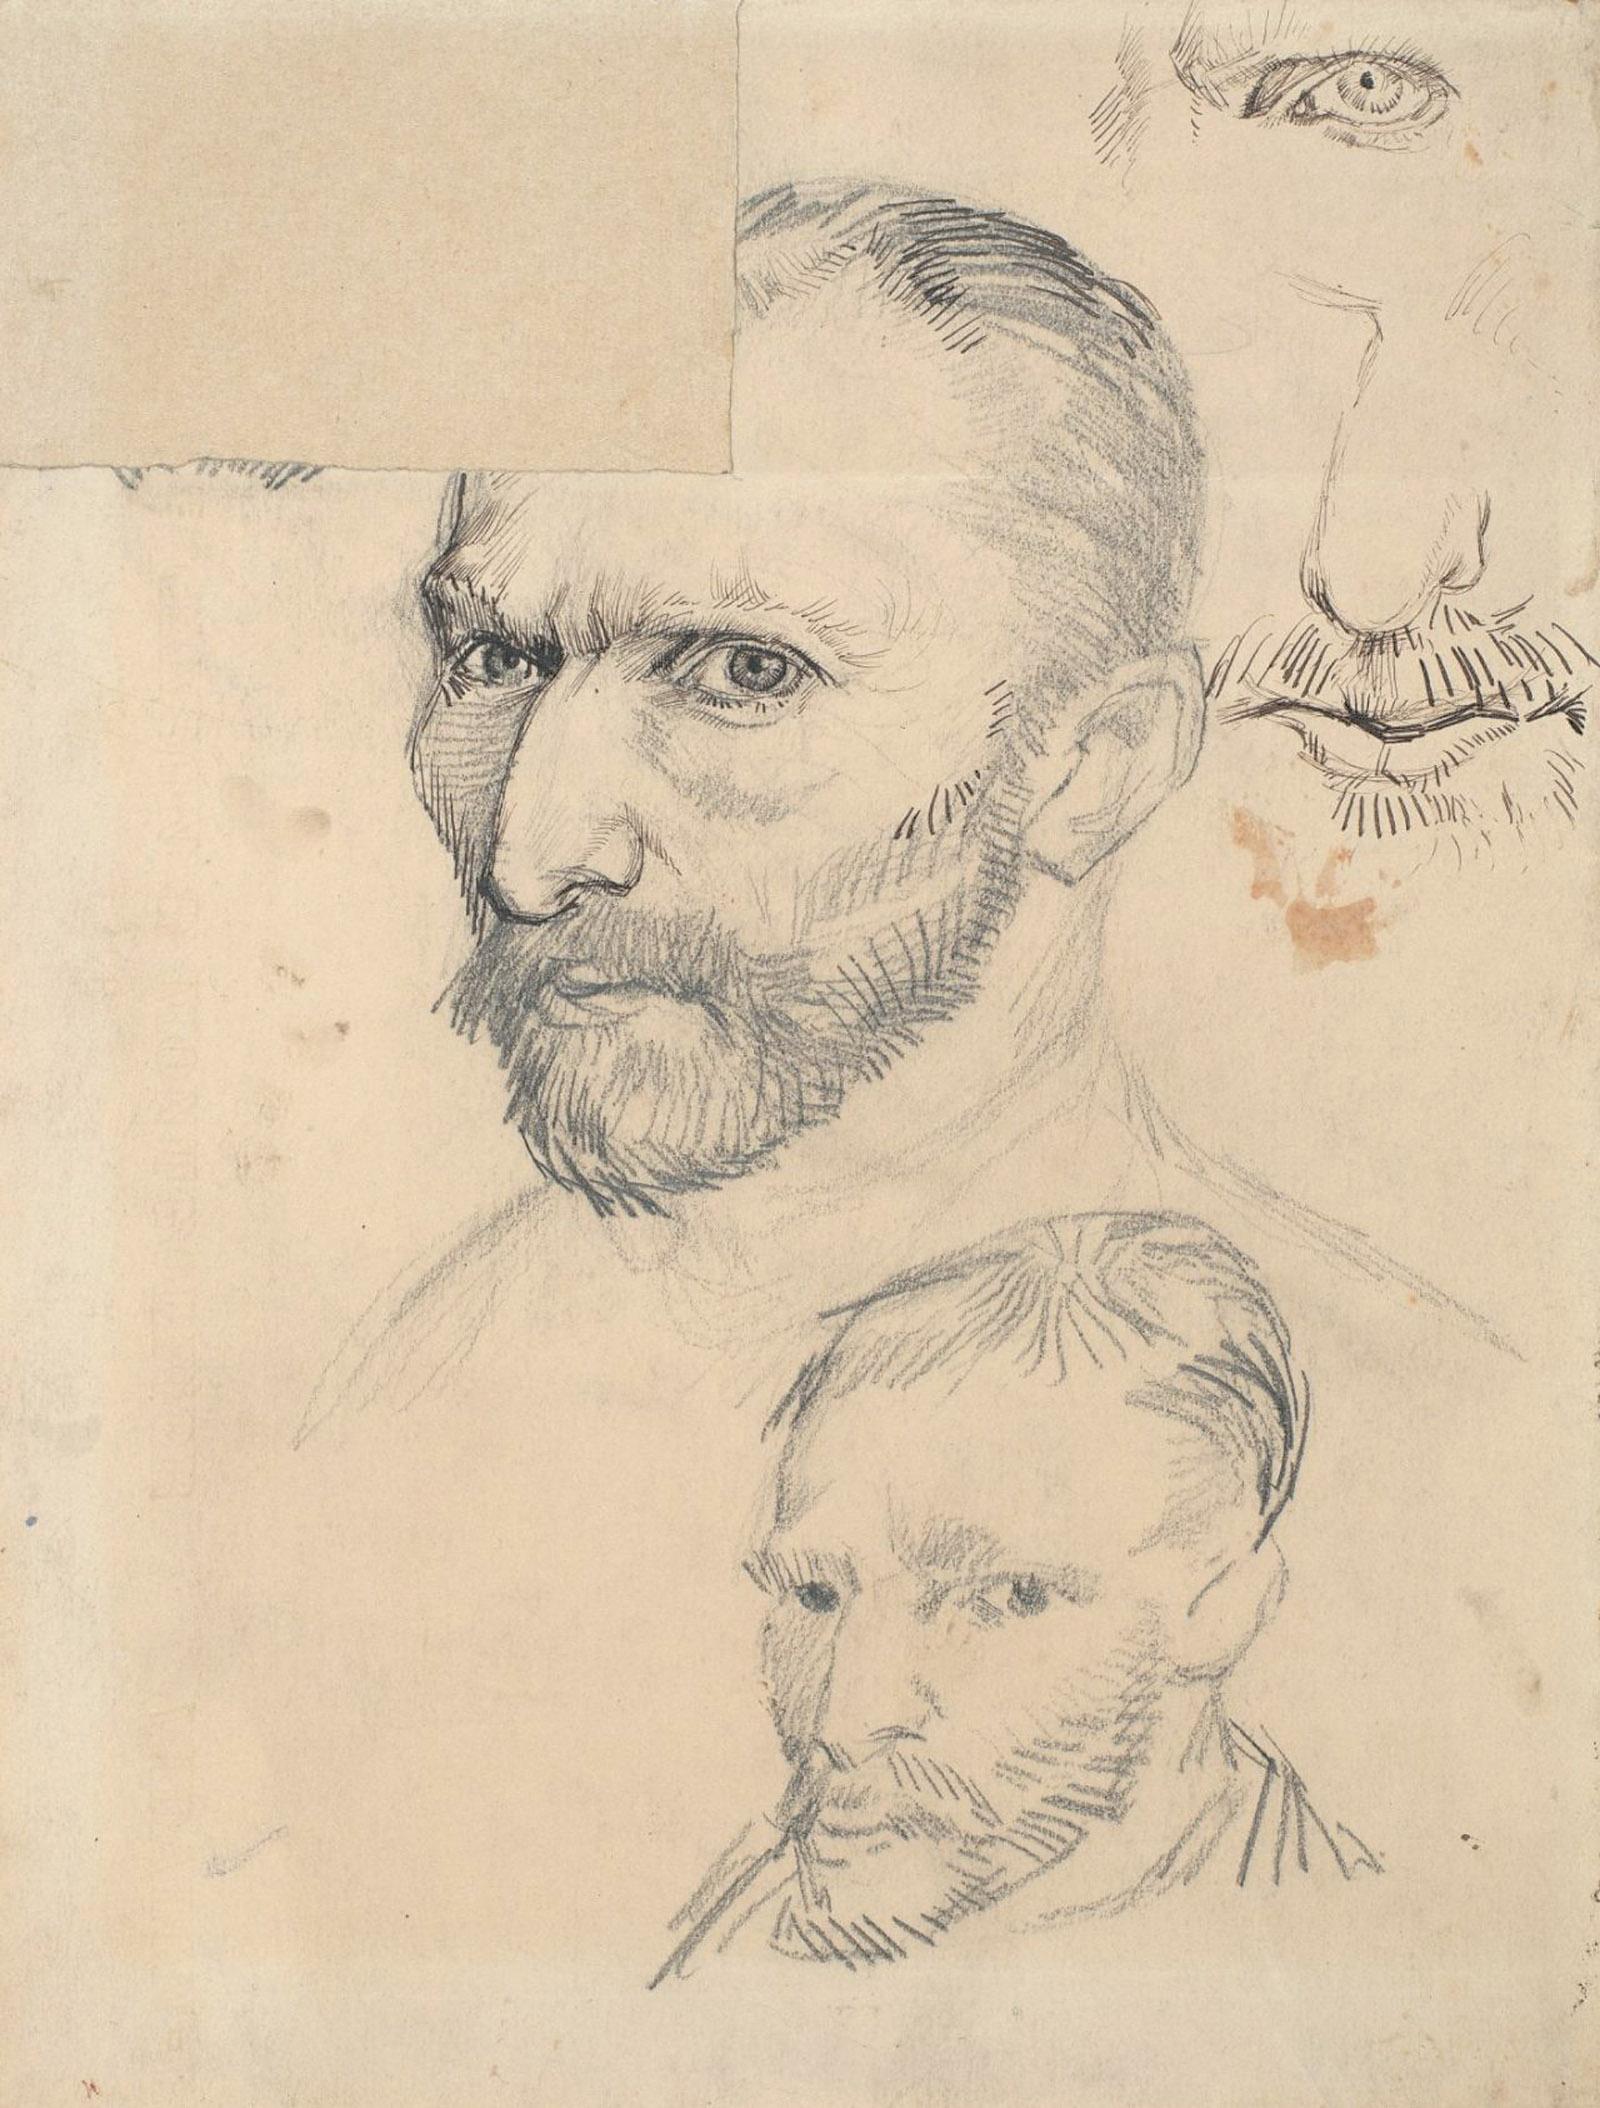 Self-Portraits by Vincent van Gogh